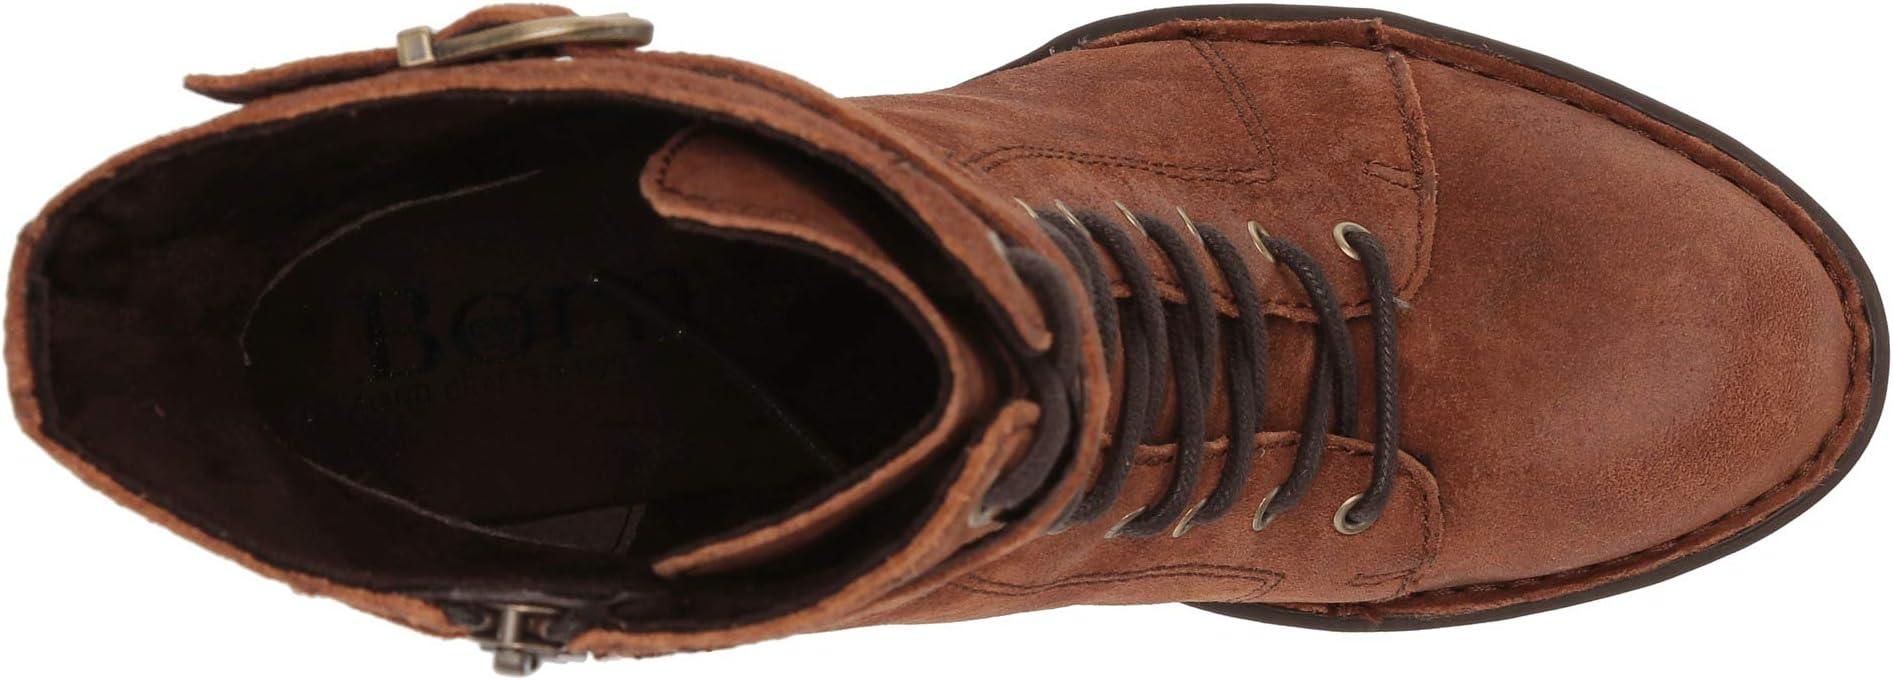 Born Cass | Women's shoes | 2020 Newest